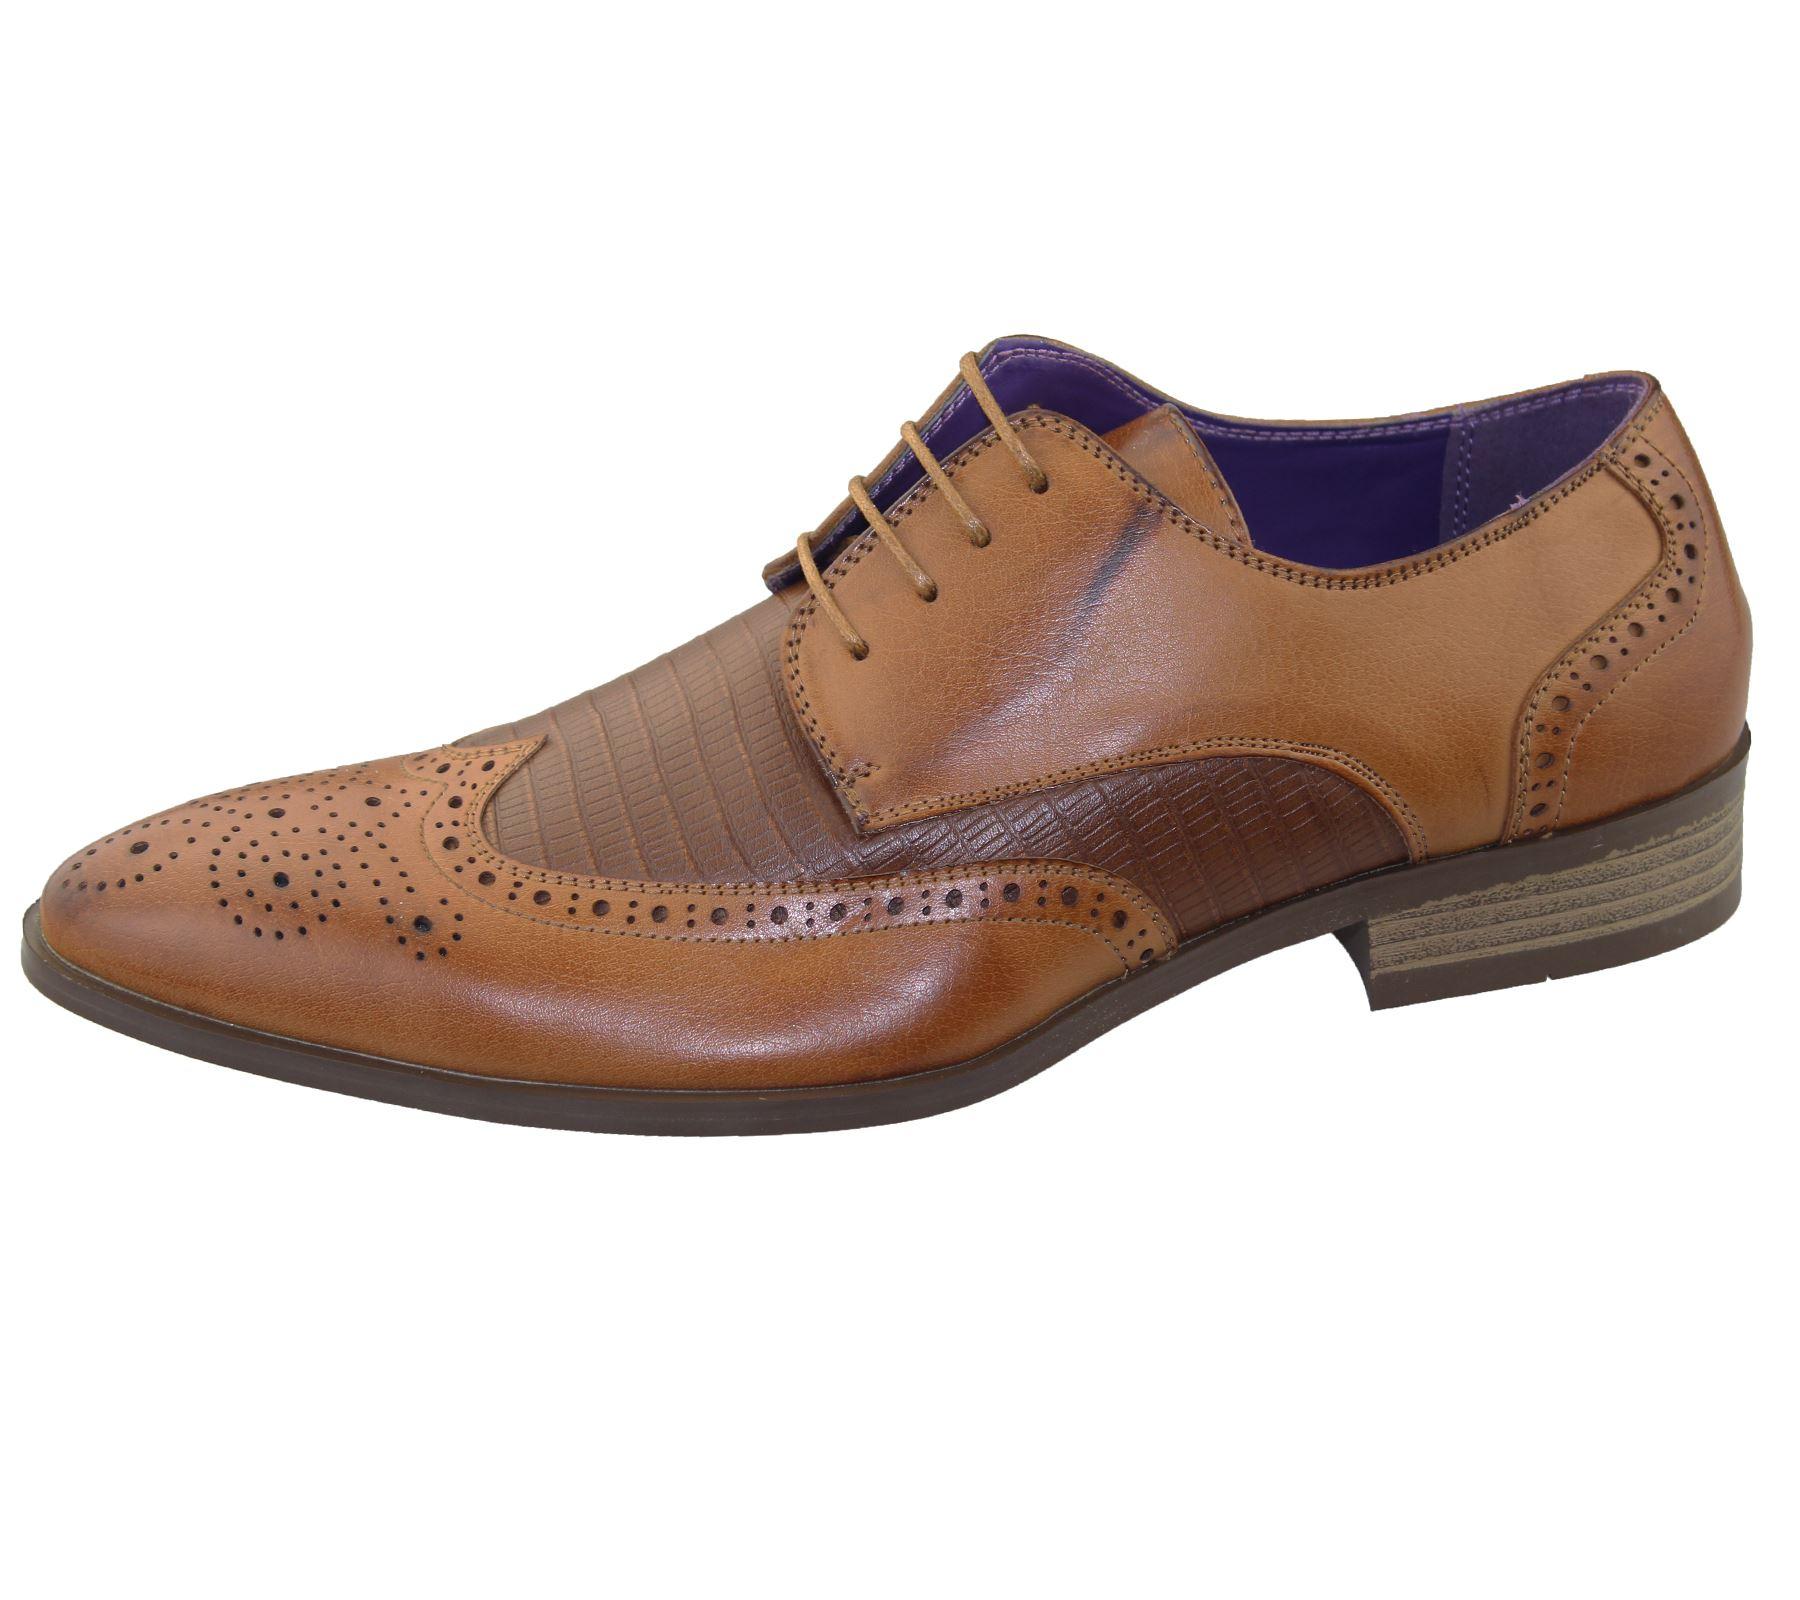 d4c8ad85d58 Mens Brogue Shoes Office Wedding Casual Formal Smart Dress Shoes New ...